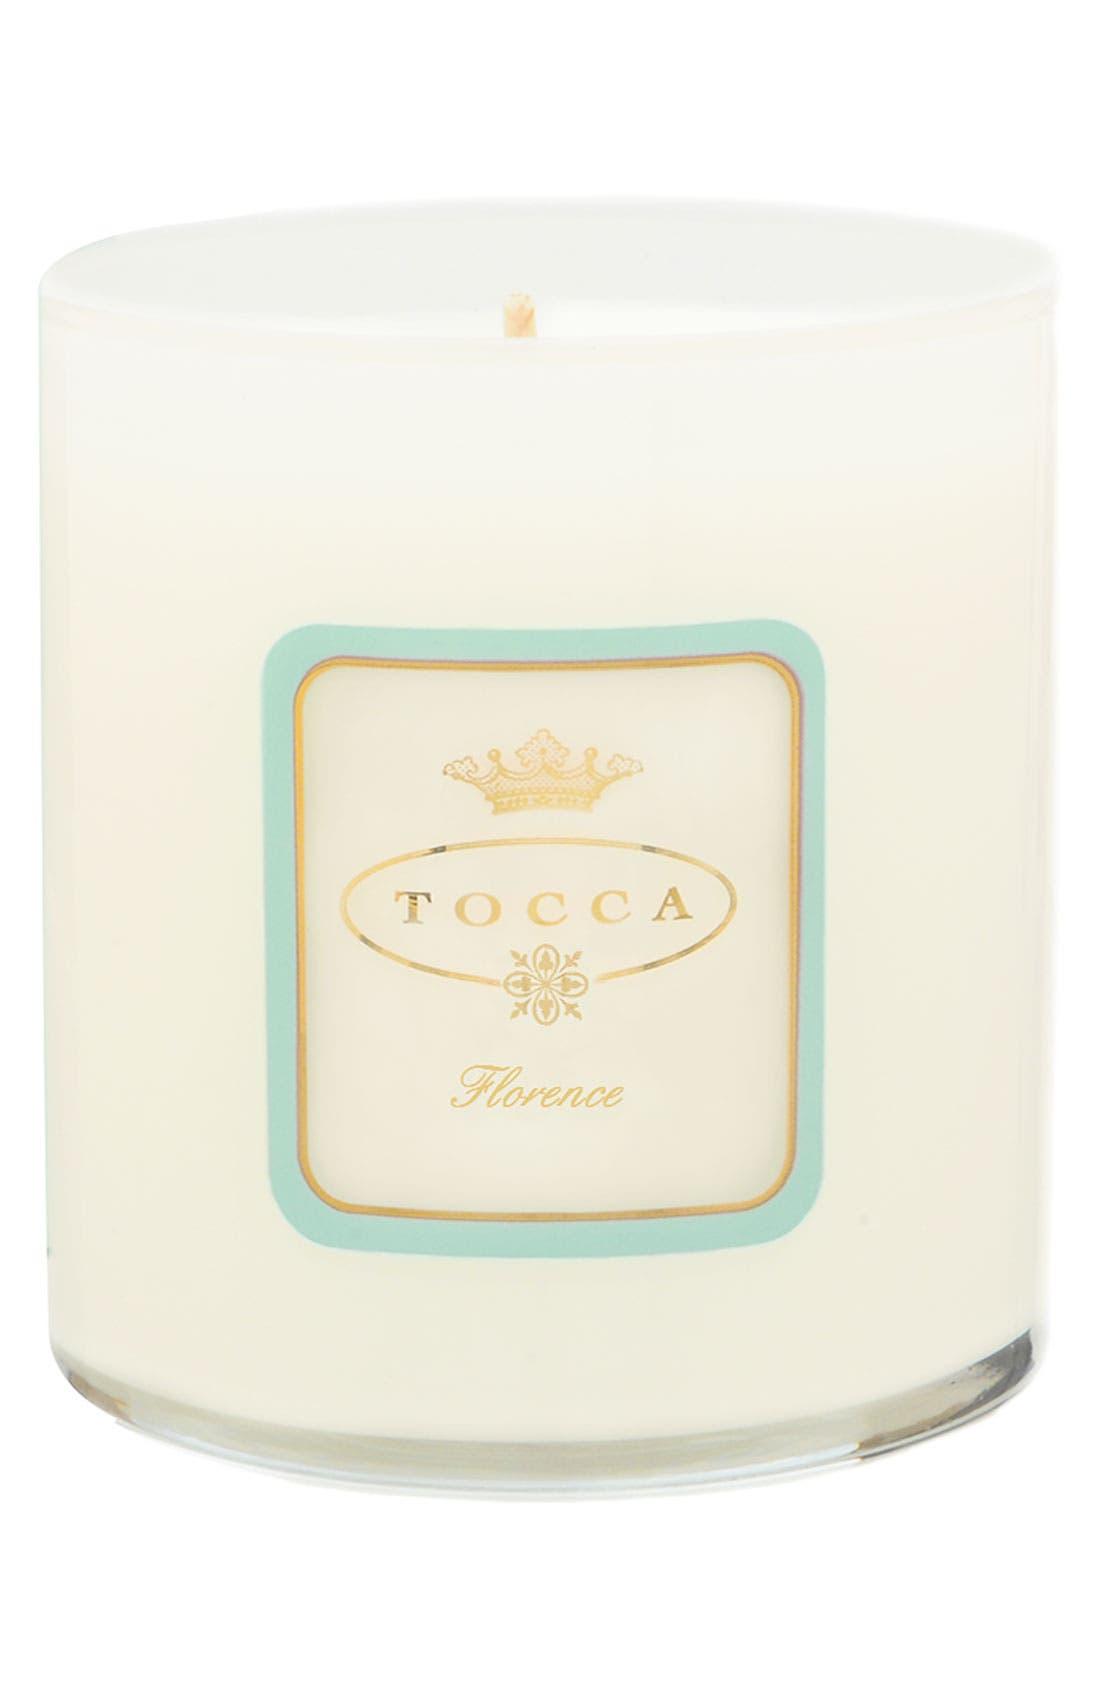 Alternate Image 1 Selected - TOCCA 'Florence' Candela